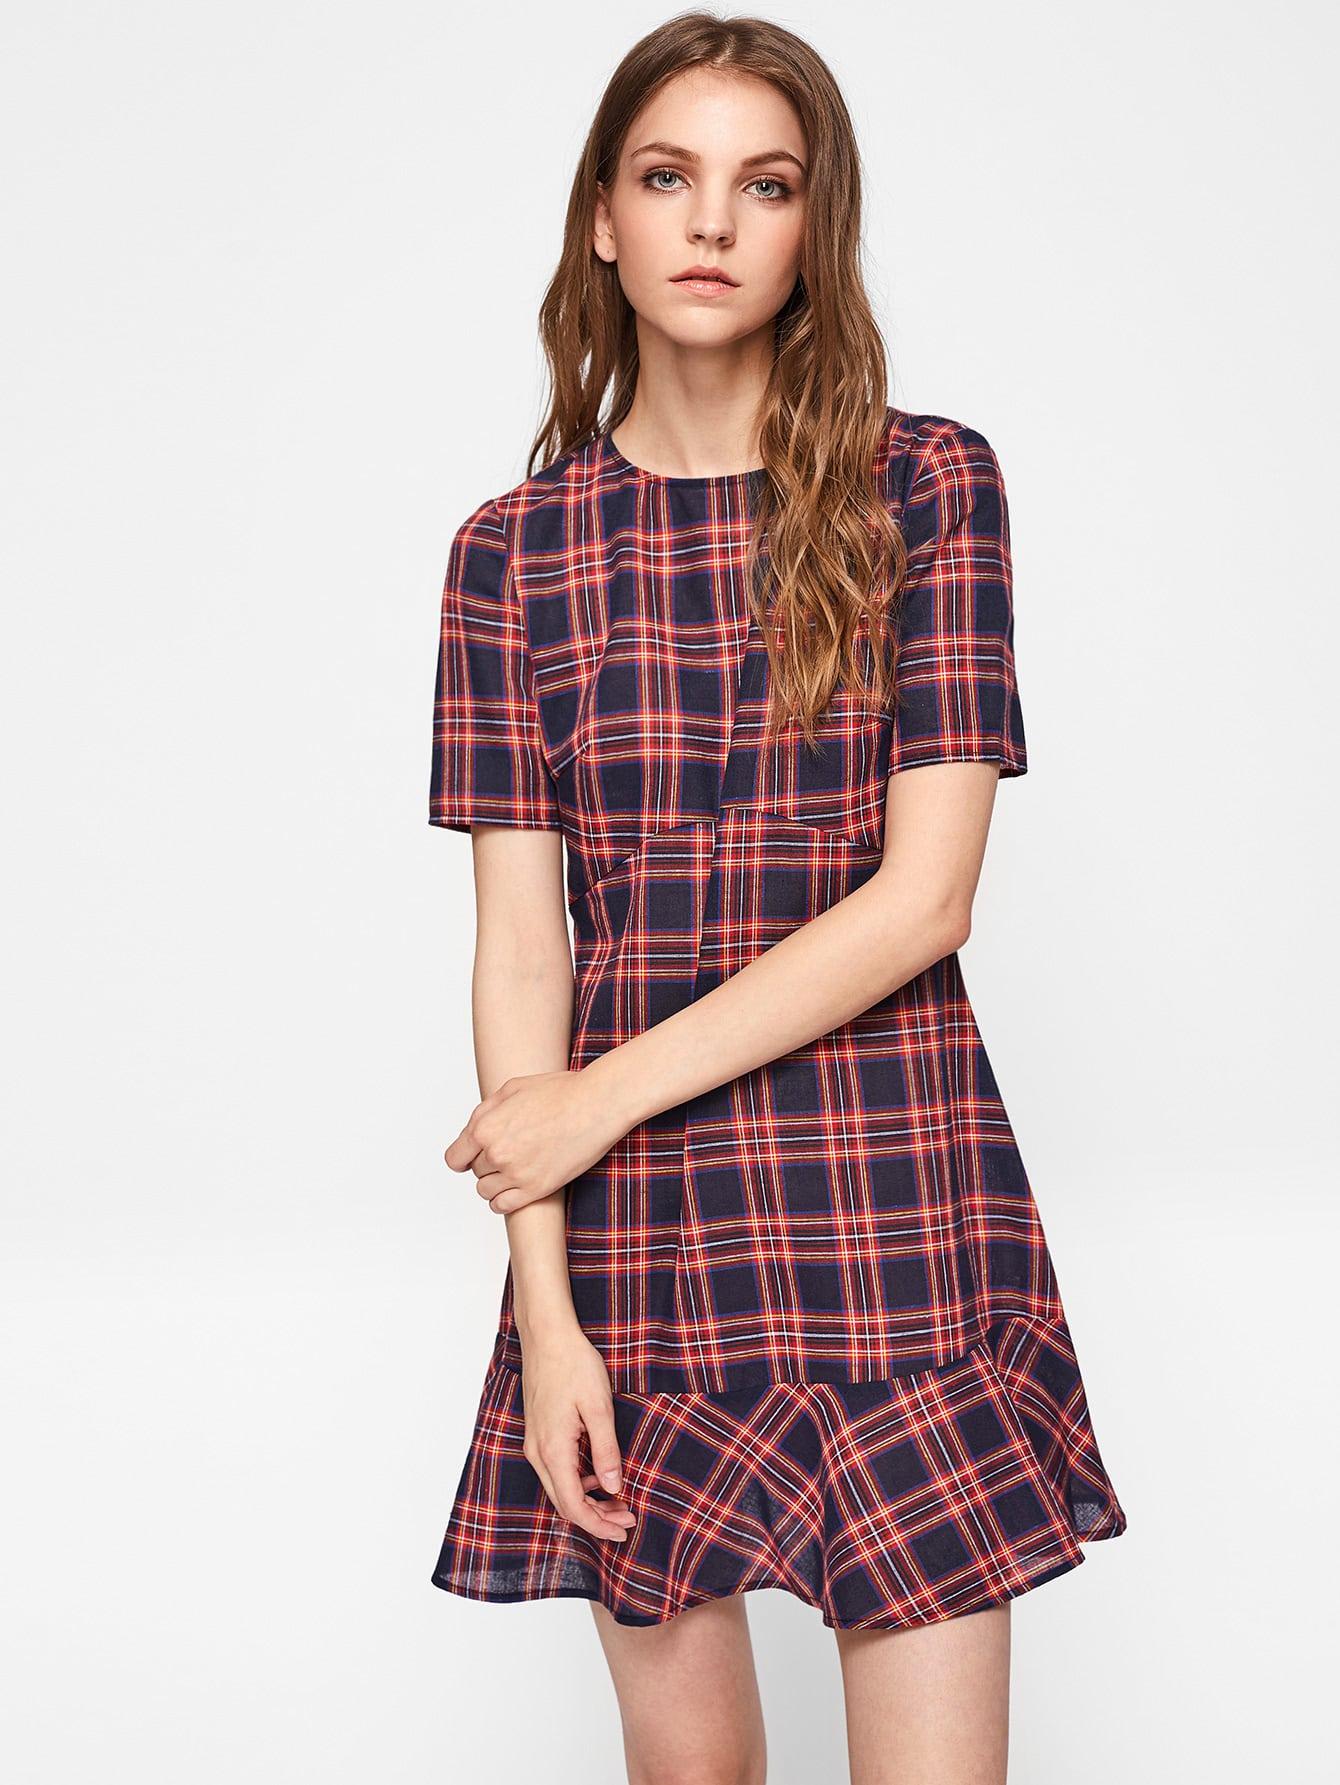 Ruffle Hem Cut And Sew Checkered Dress thumbnail